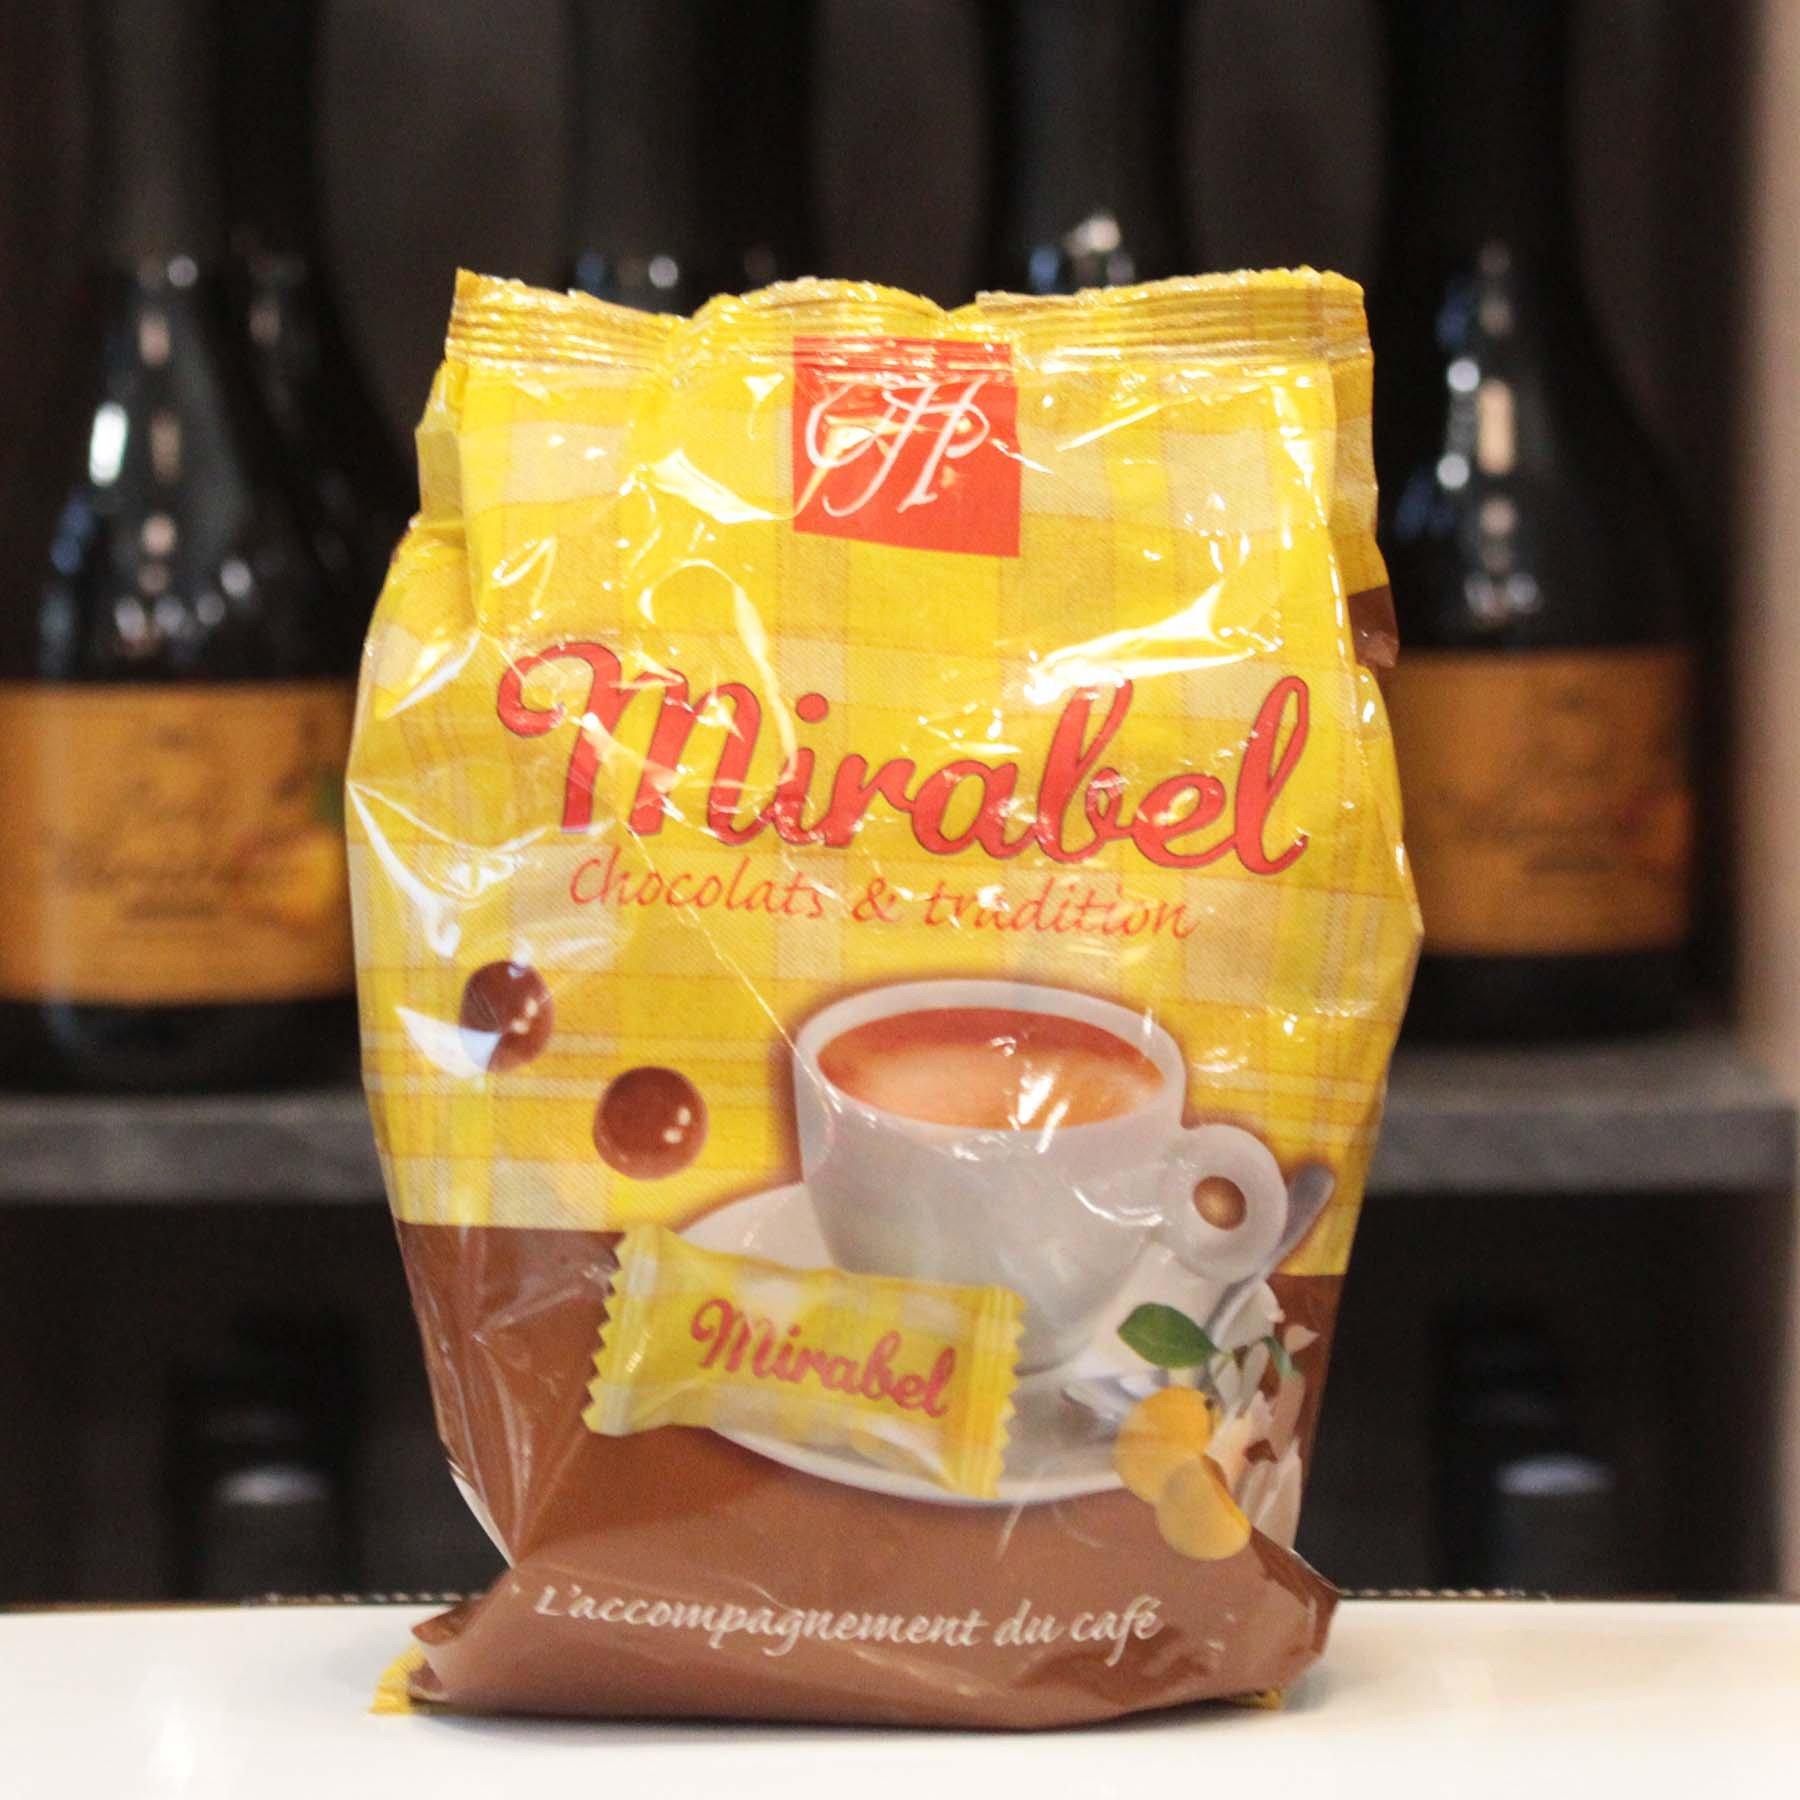 Chocolats cœur croustillant Mirabel,100g